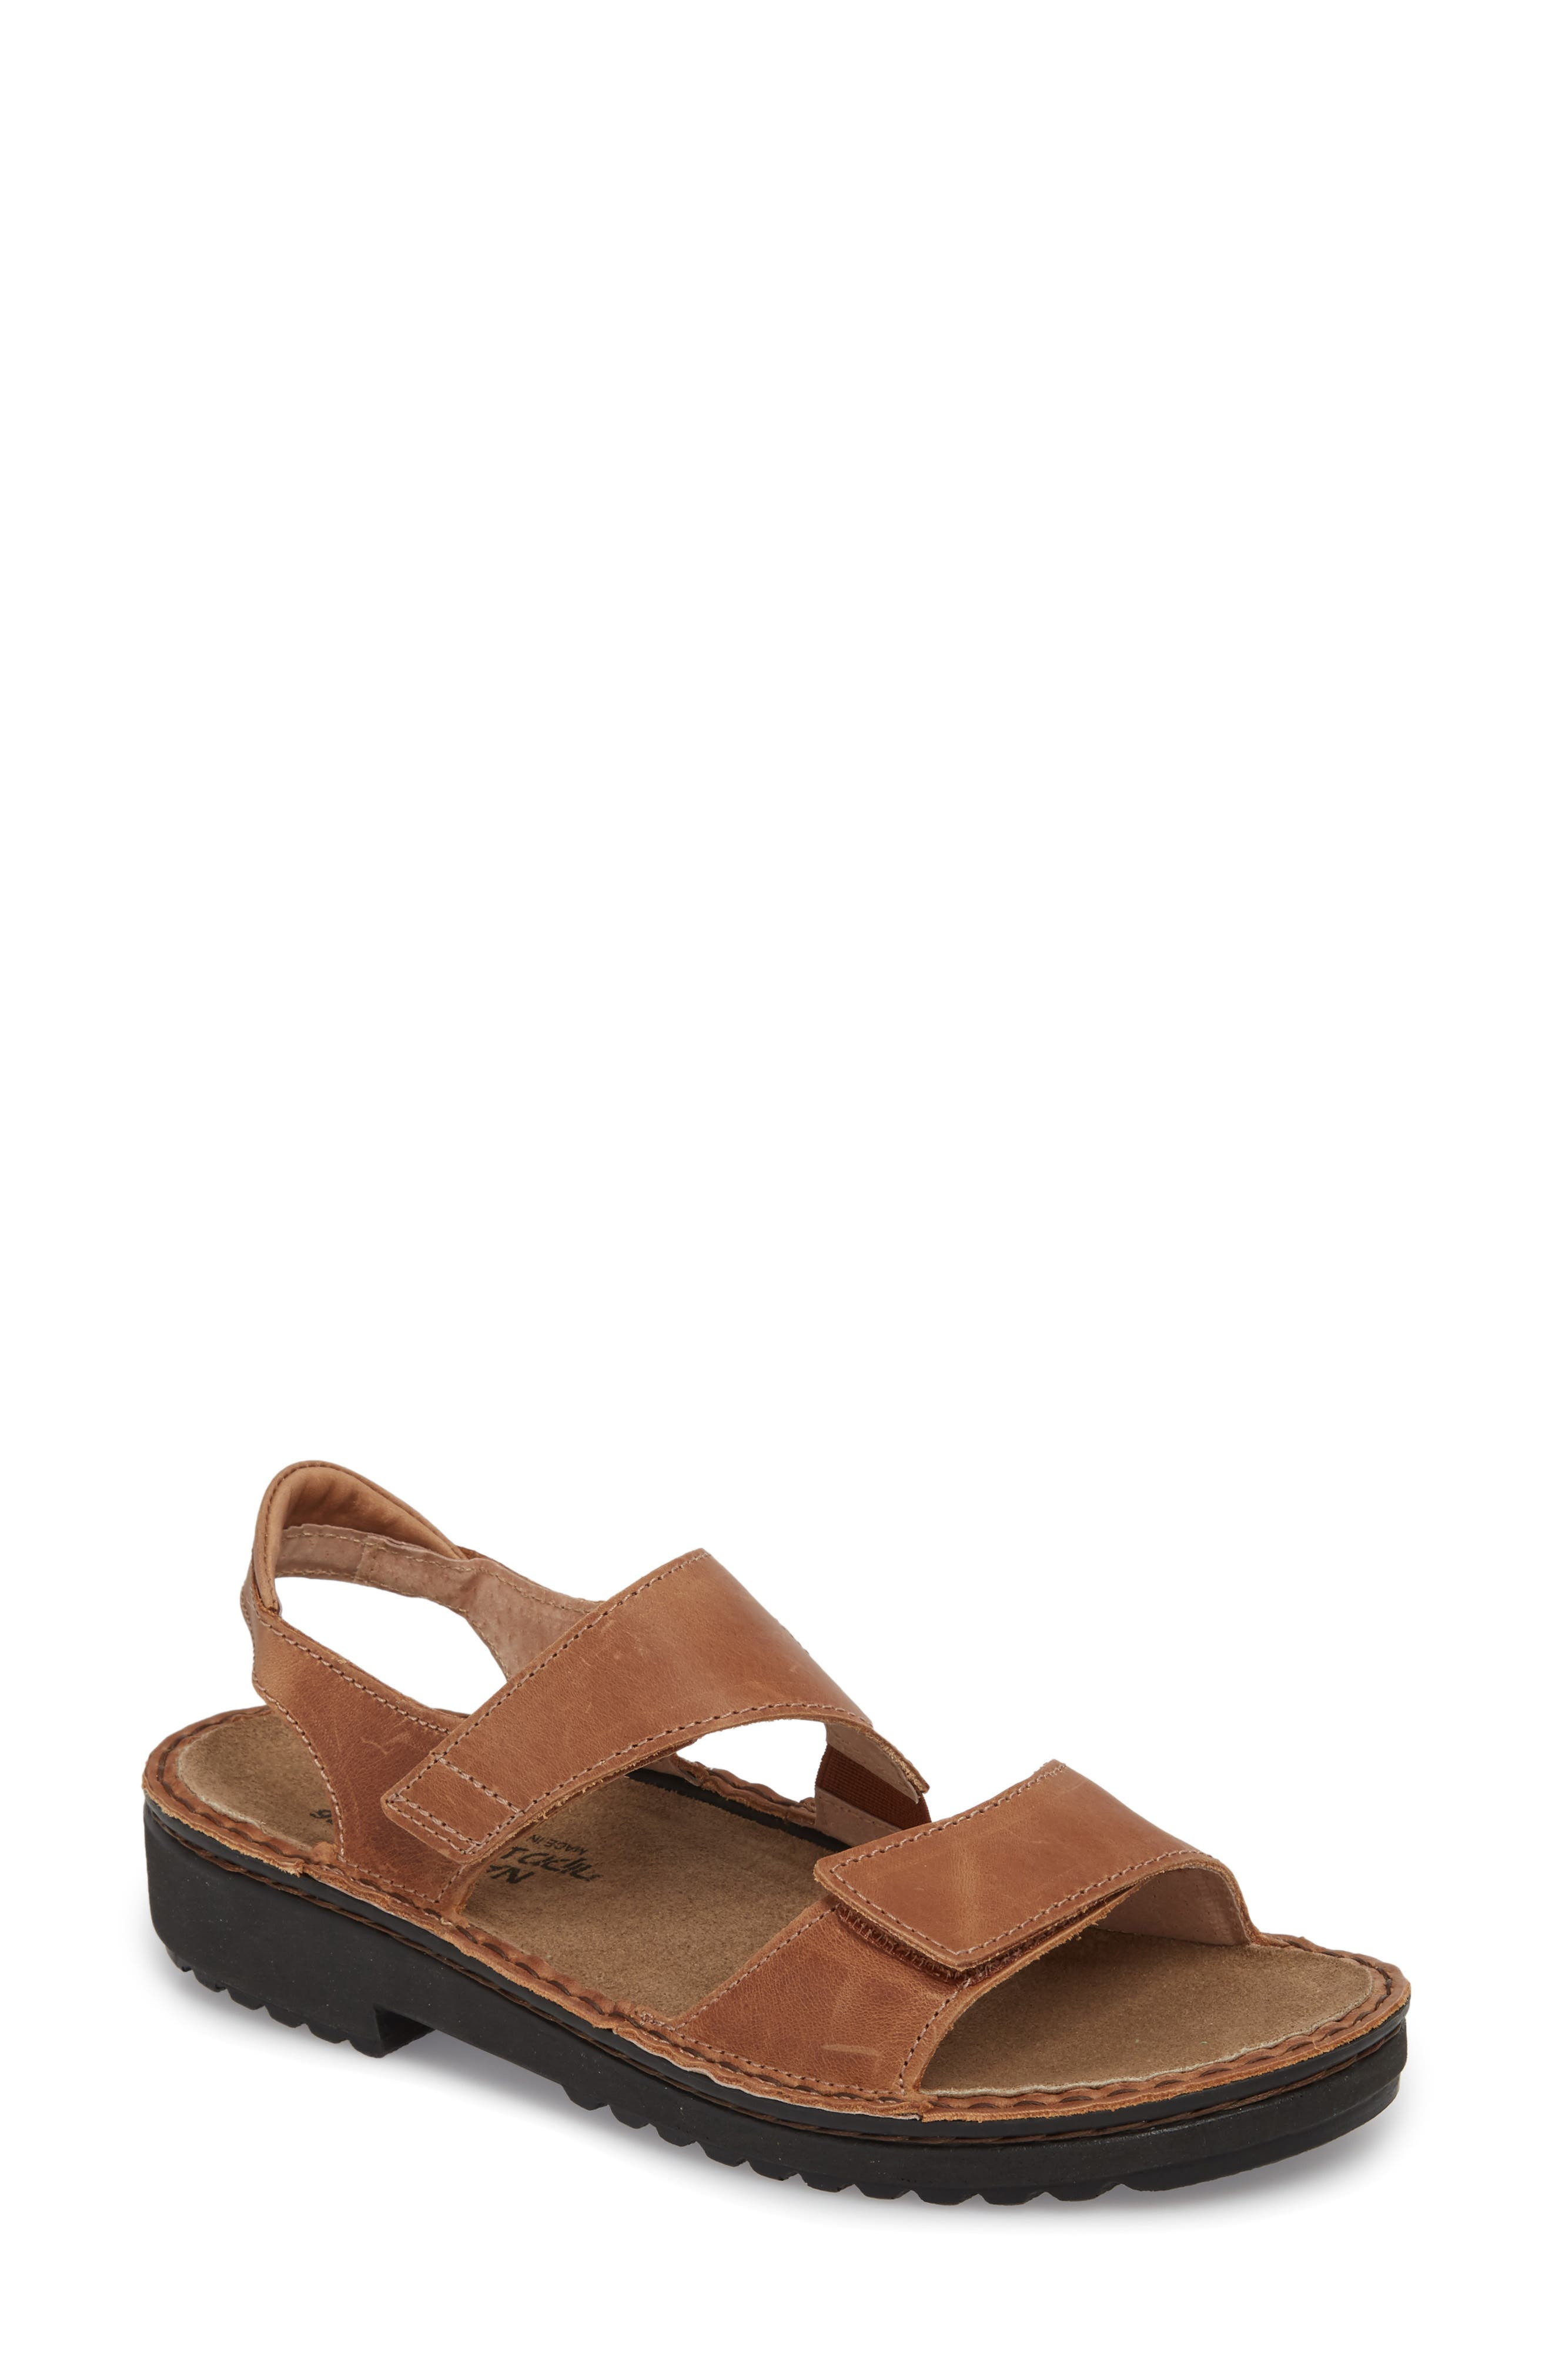 Enid Sandal,                         Main,                         color, LATTE BROWN LEATHER